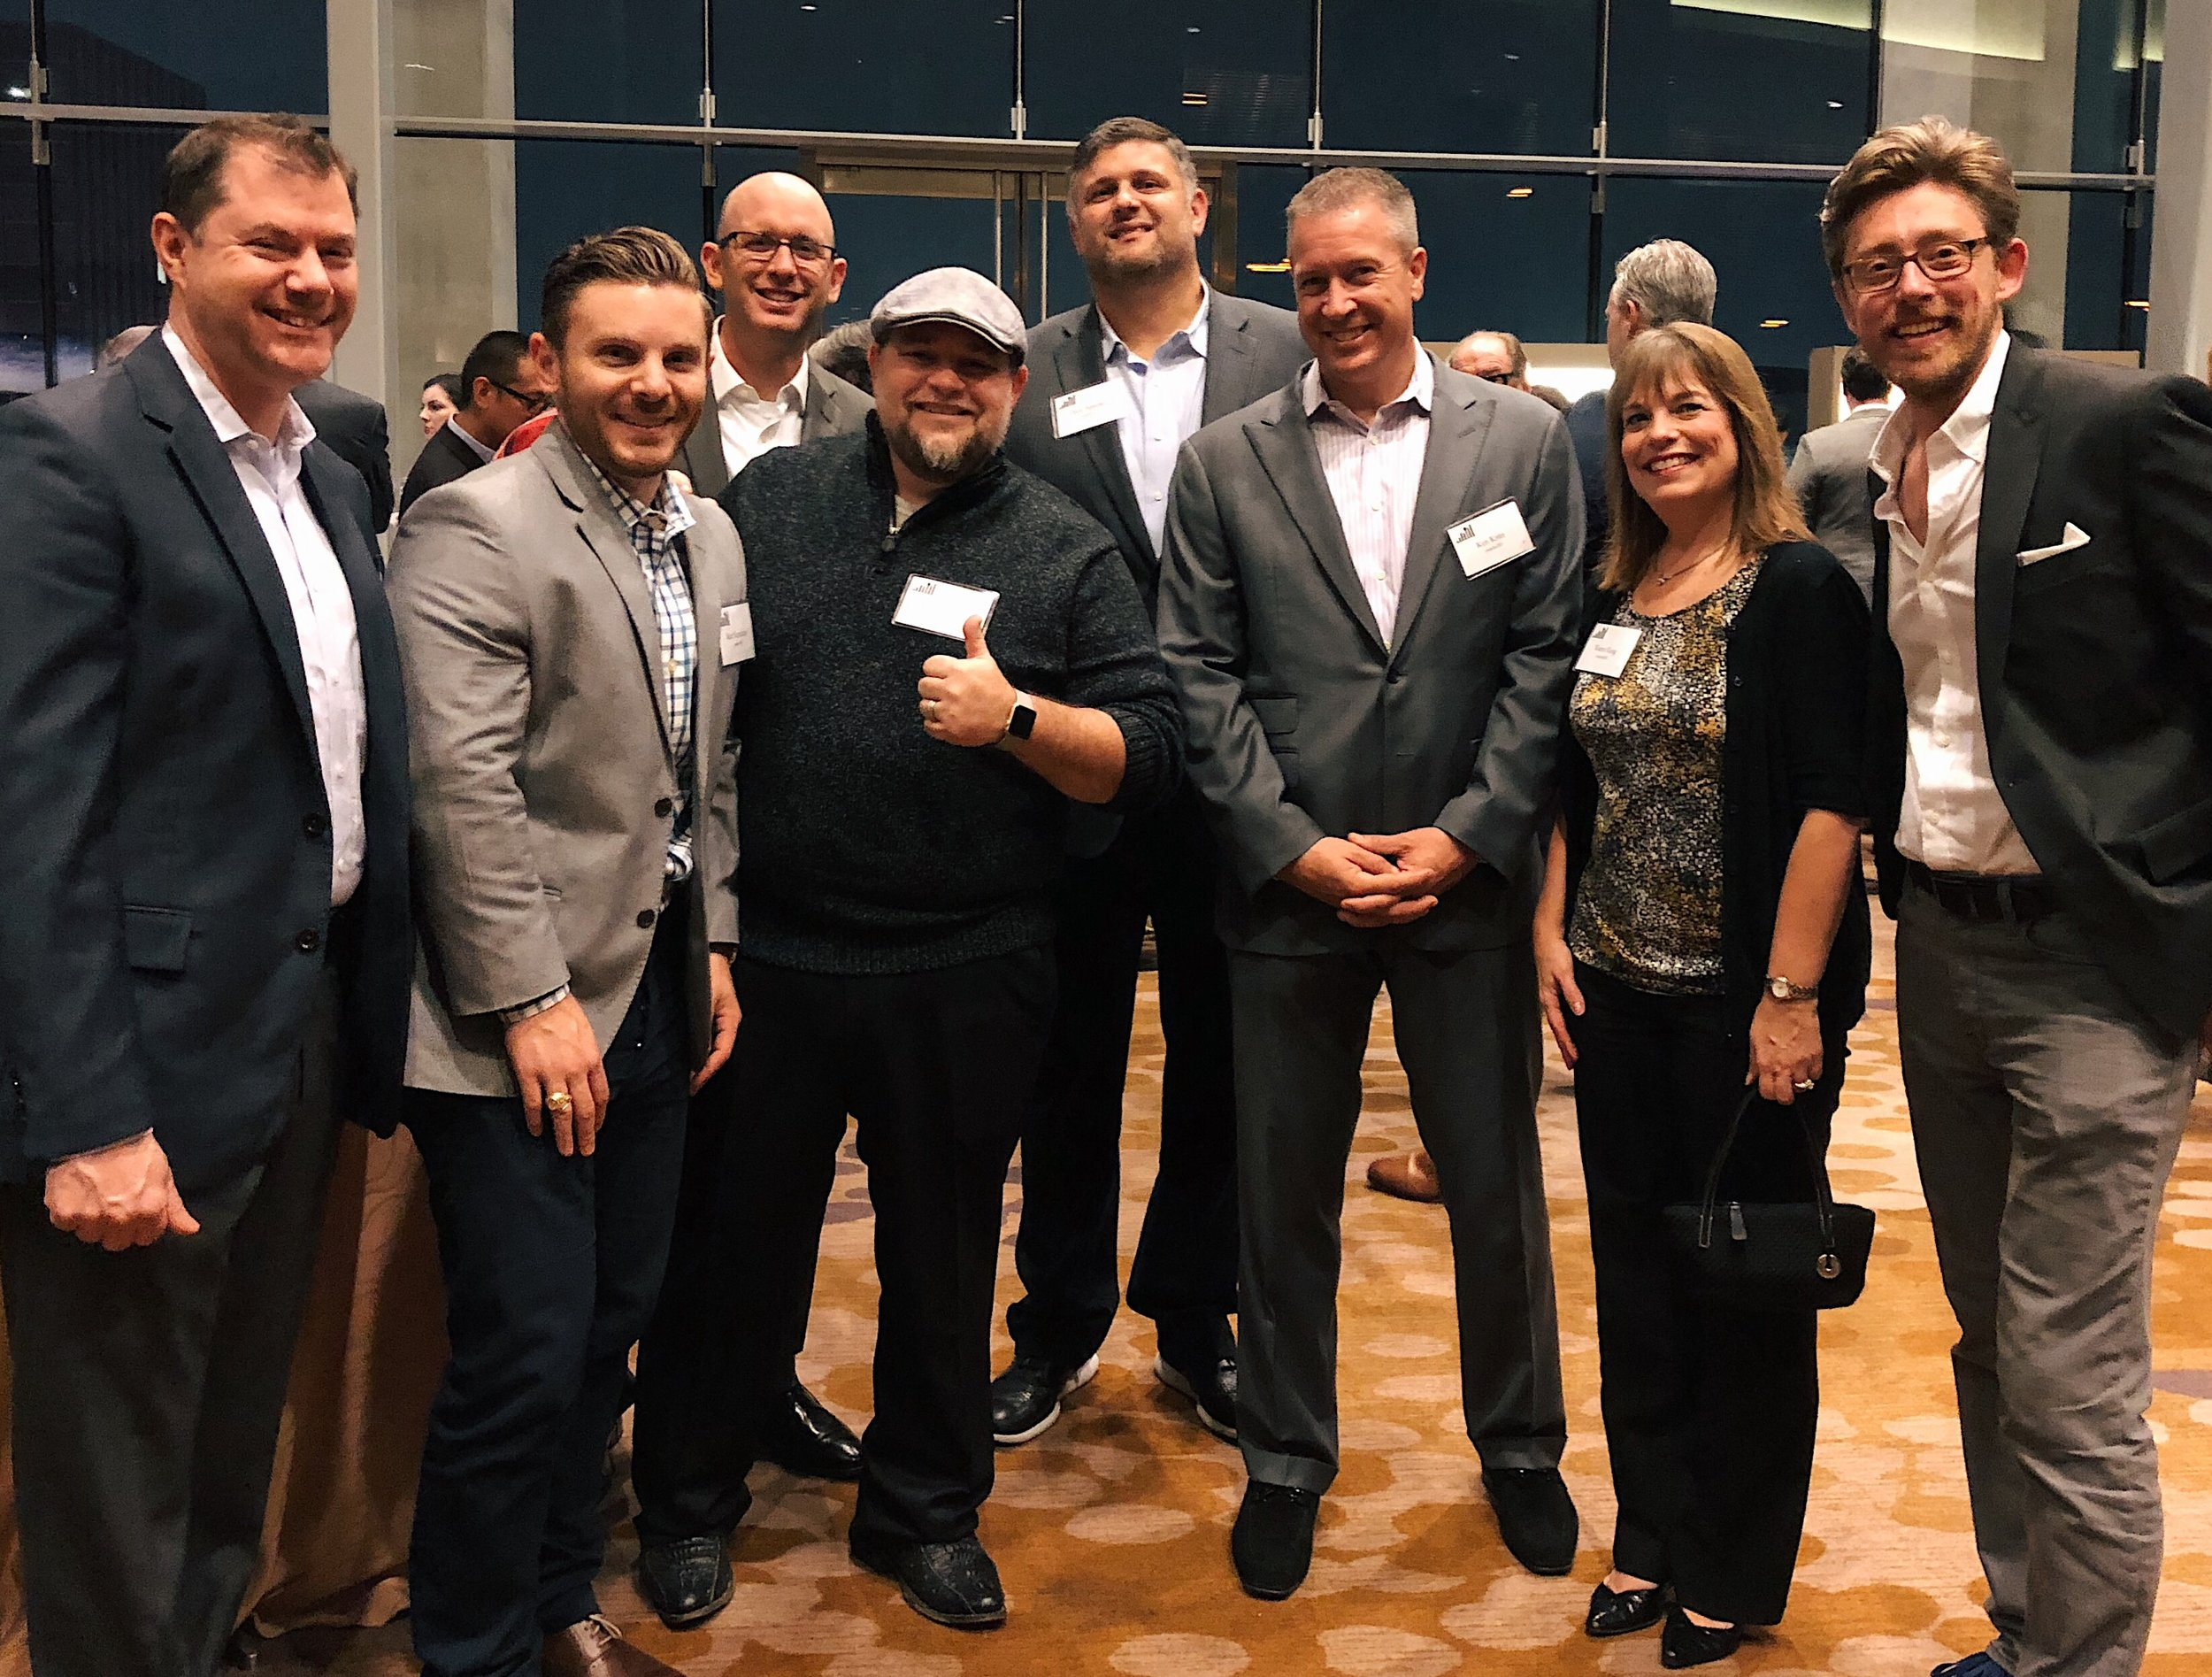 Joe Dyer, Matt Scamardo, Russ Bair, Kevin Fisher, Dave Jimenez, Ken Kritz, Karen King and Jeremy Johnson represent projekt202 at the 2017 Dallas 100 awards.